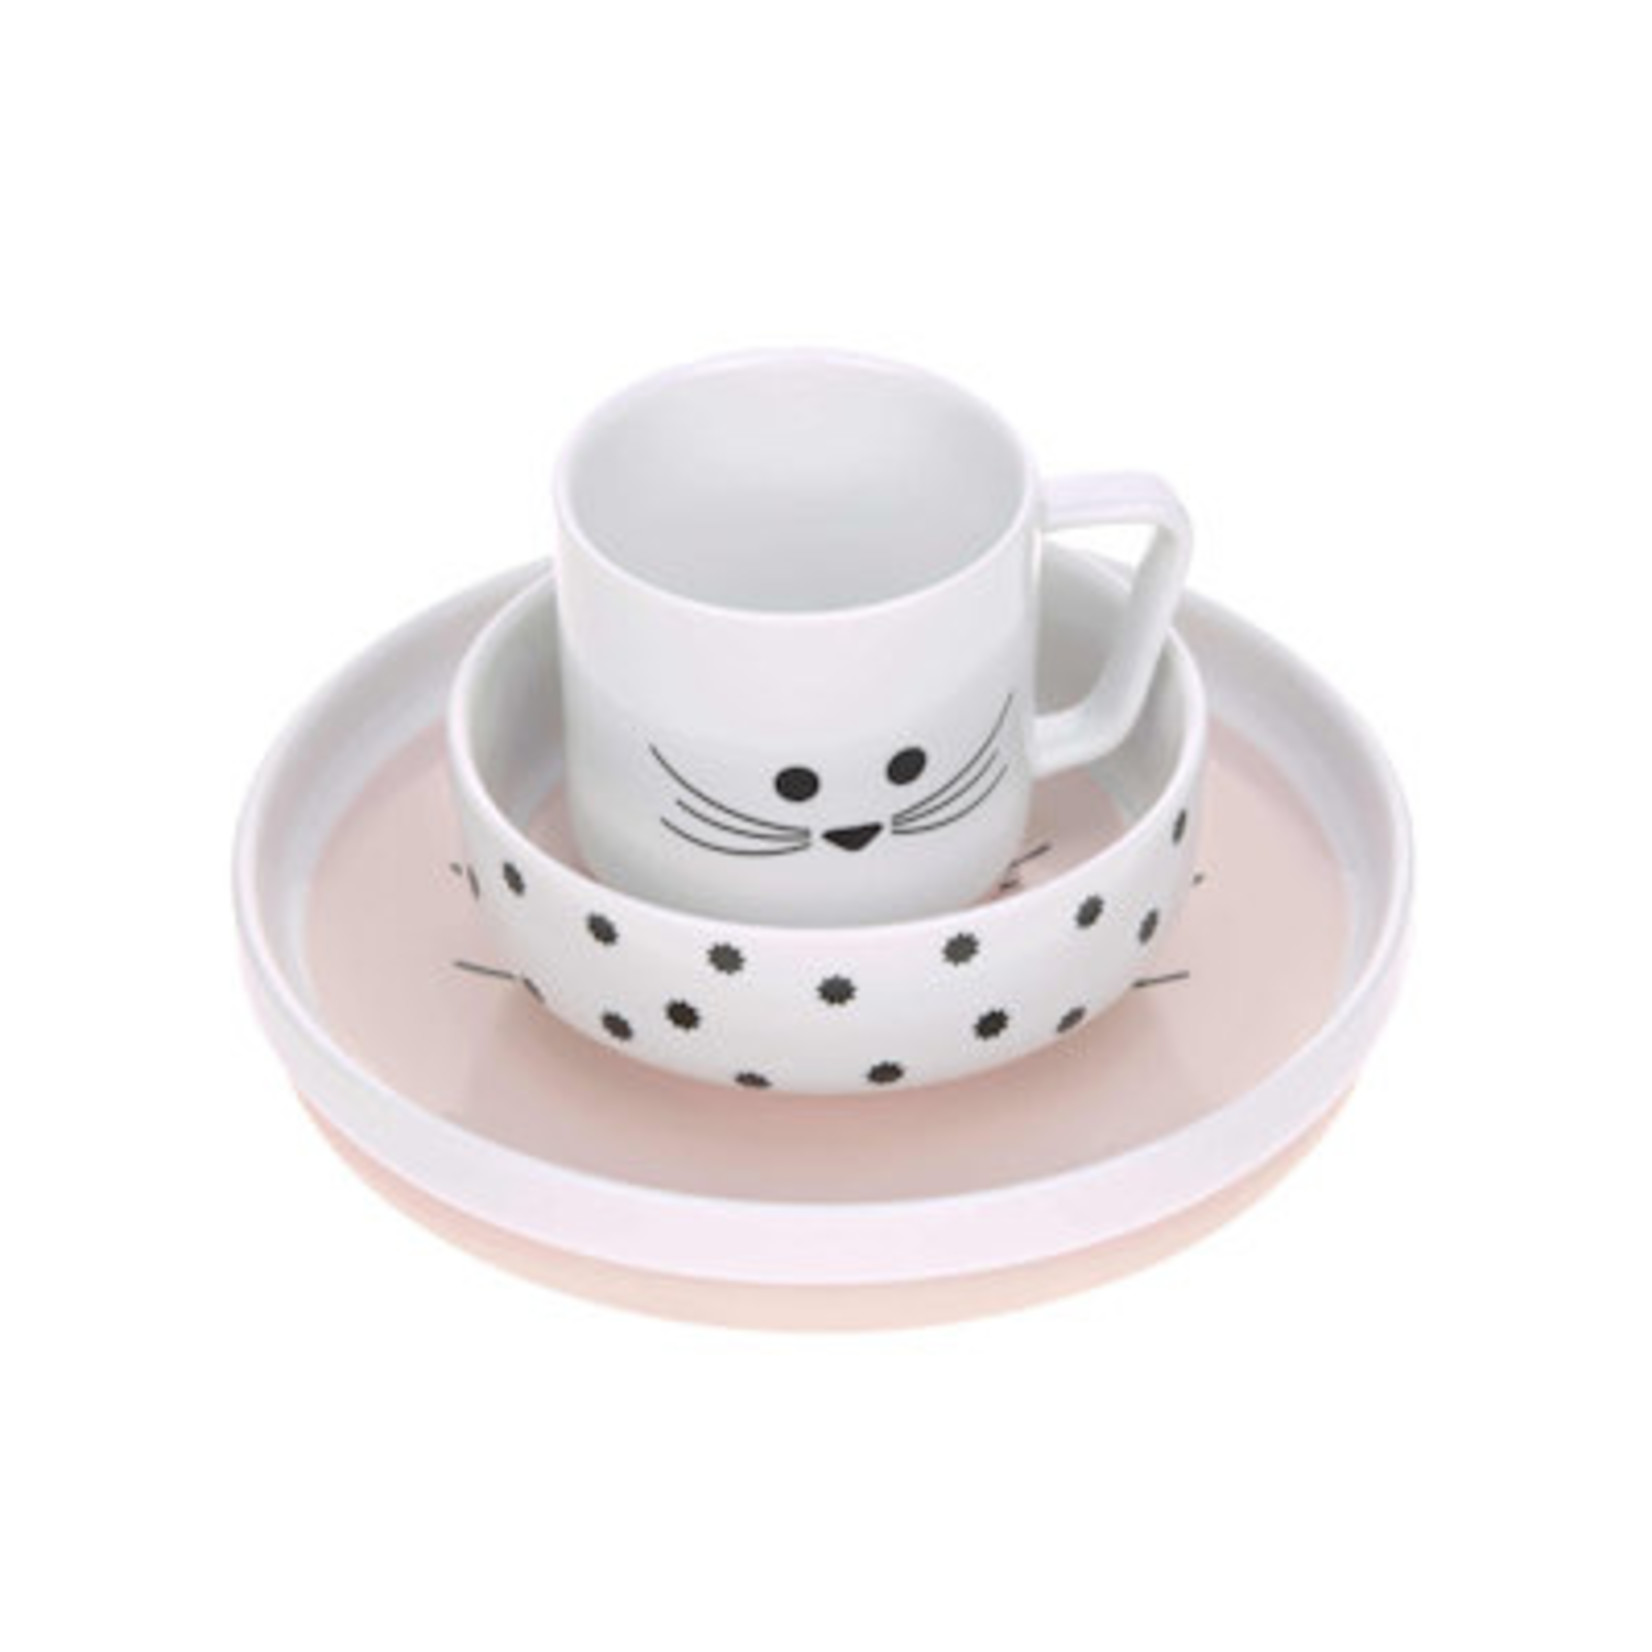 Lässig Lässig Porceleinen Servies setje Little Chums Muis